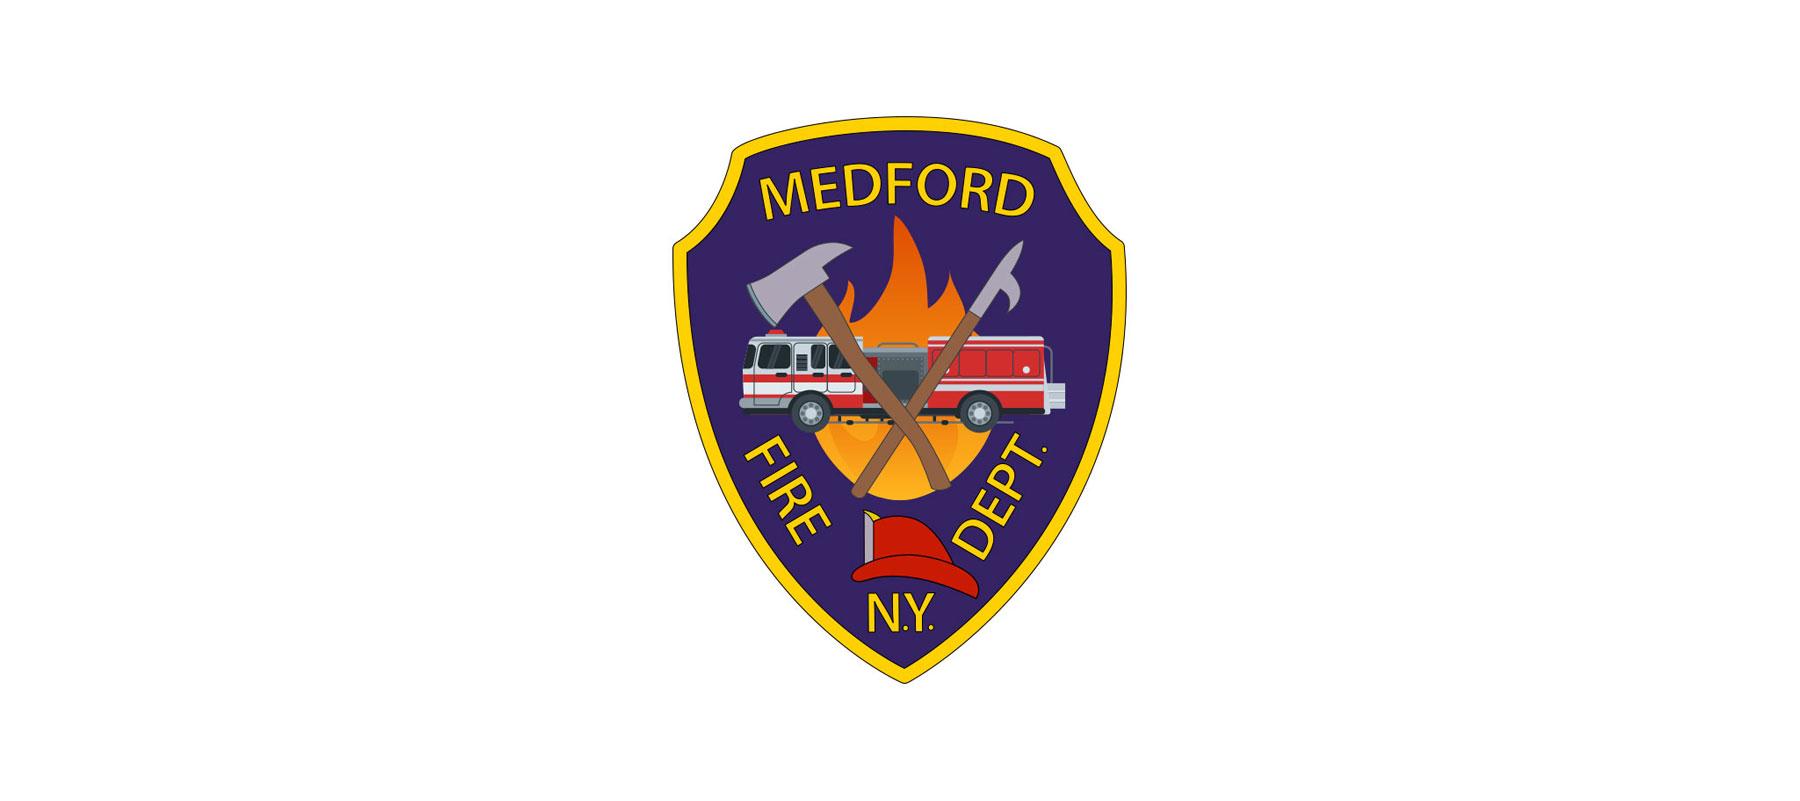 Tri-State LED Completes LED Retrofit for Medford Fire Department